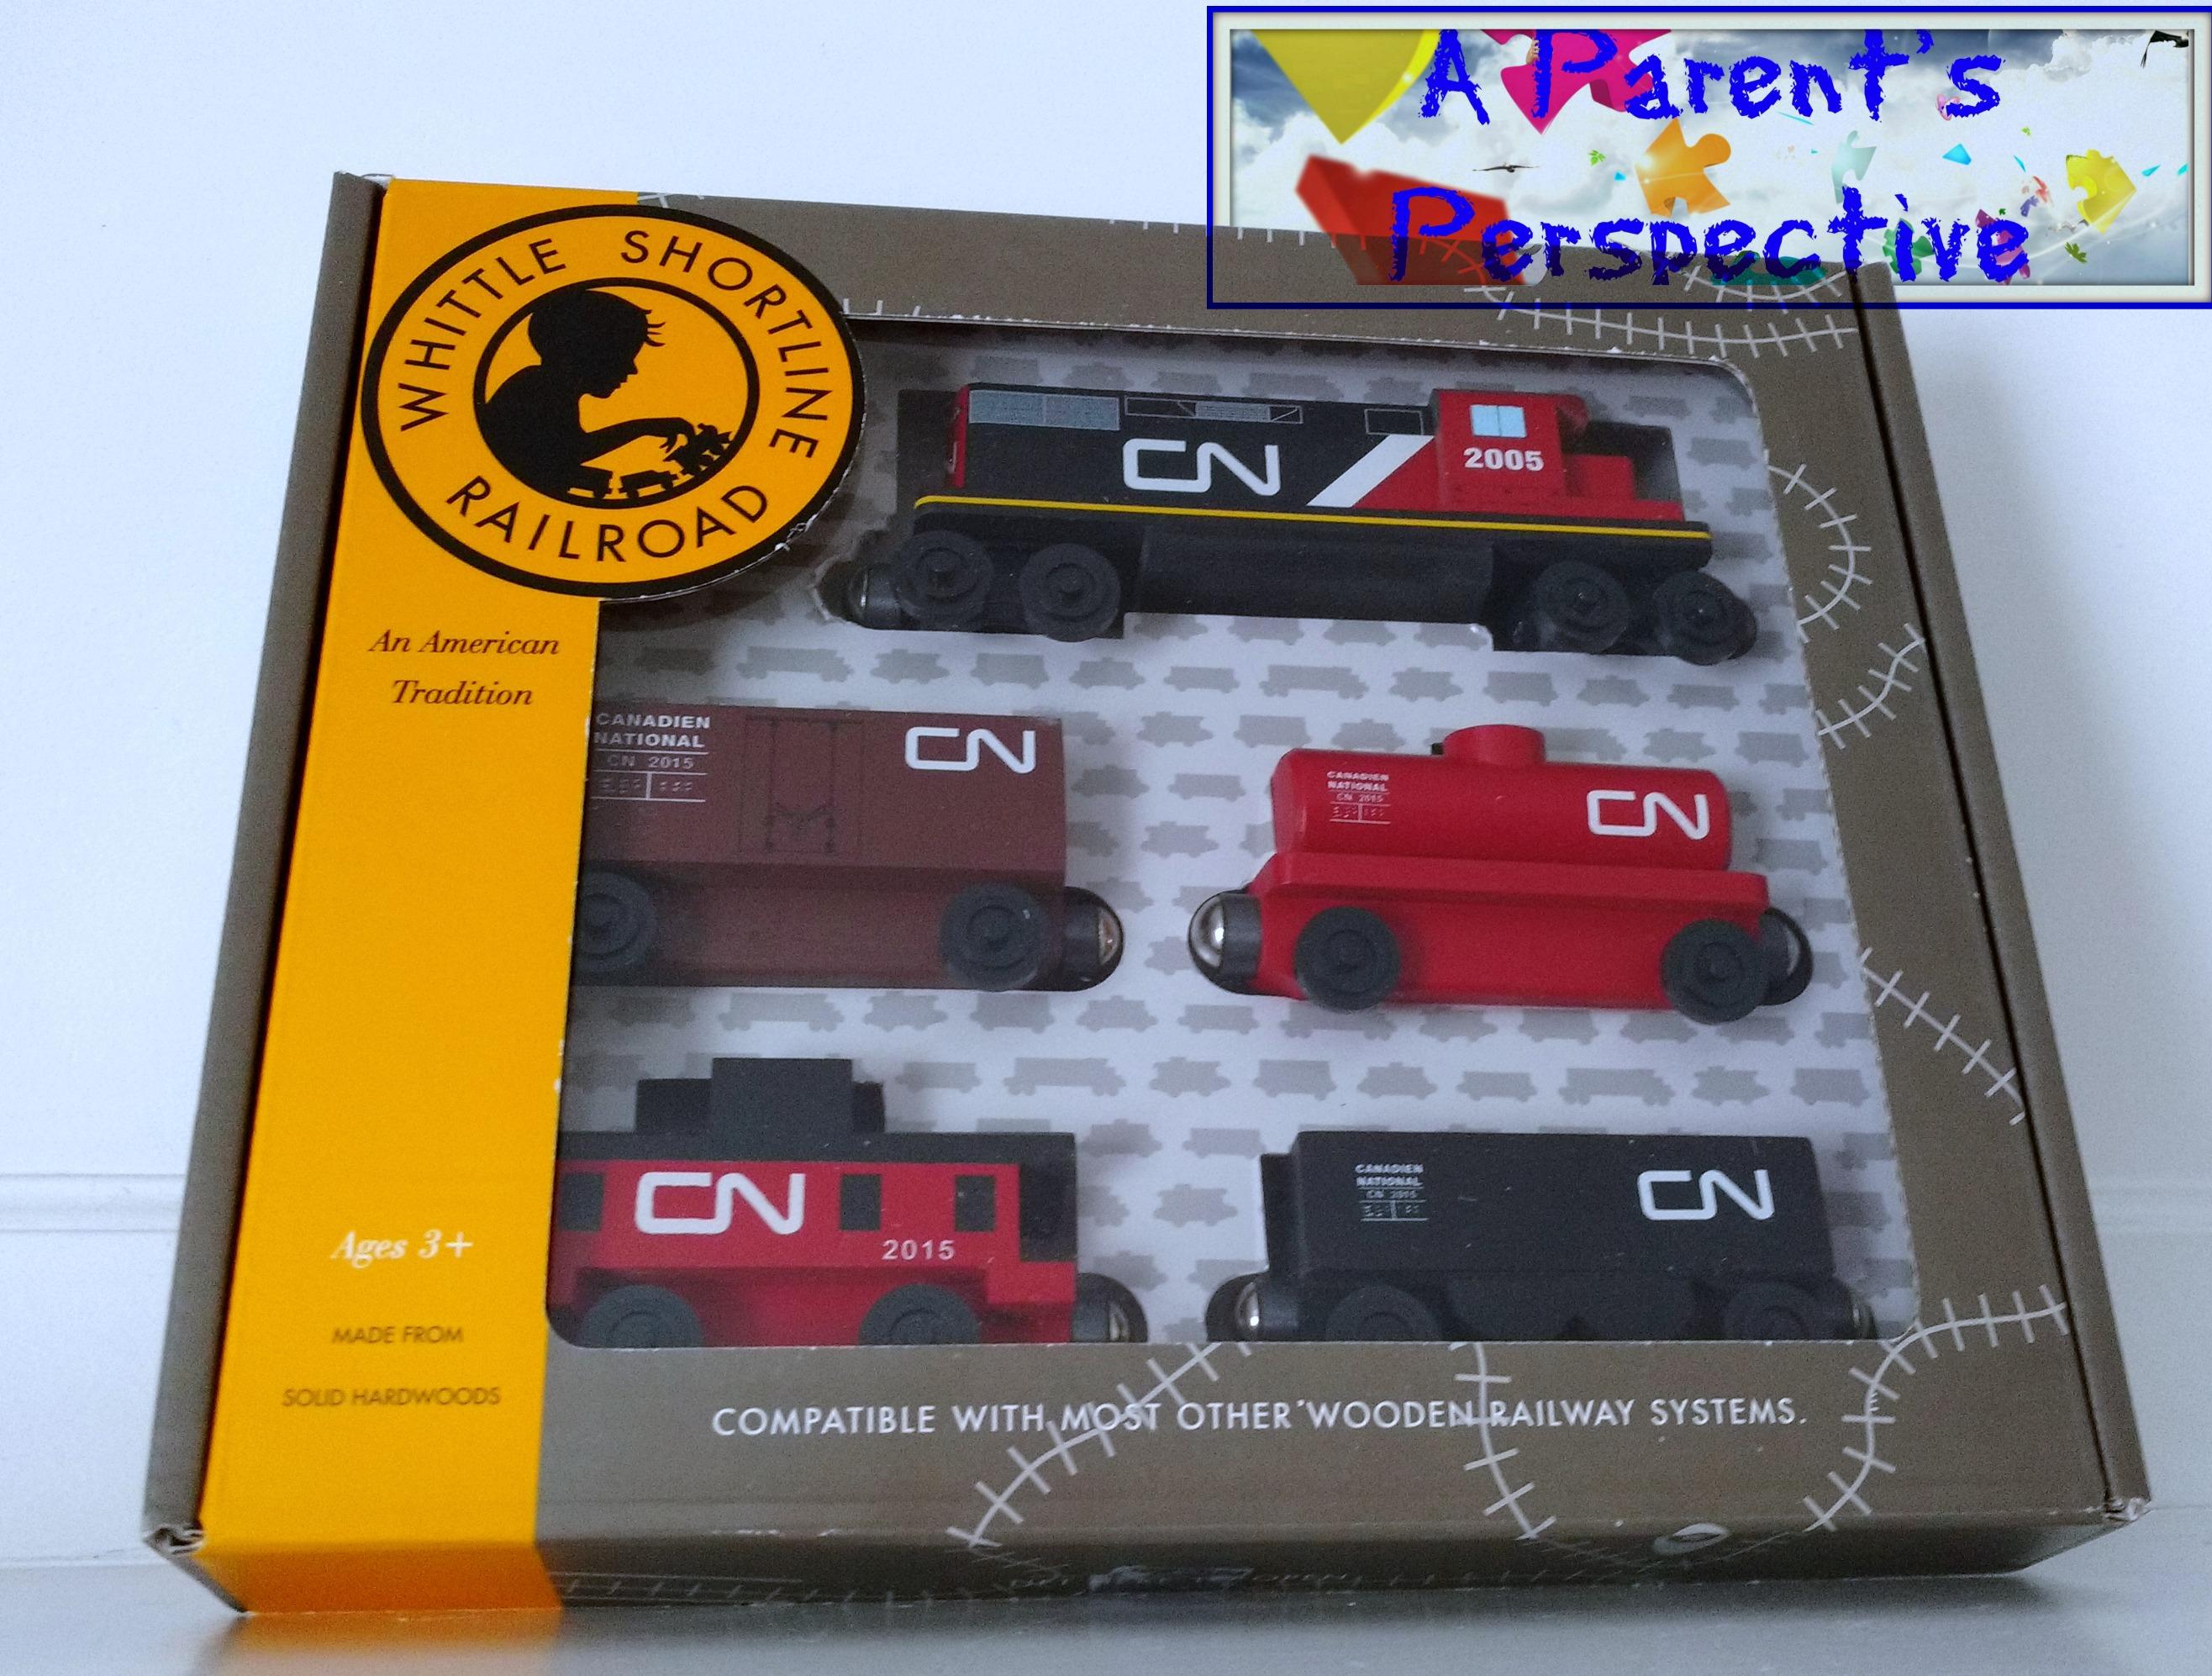 Whittle Shortline Railroad Canadian National